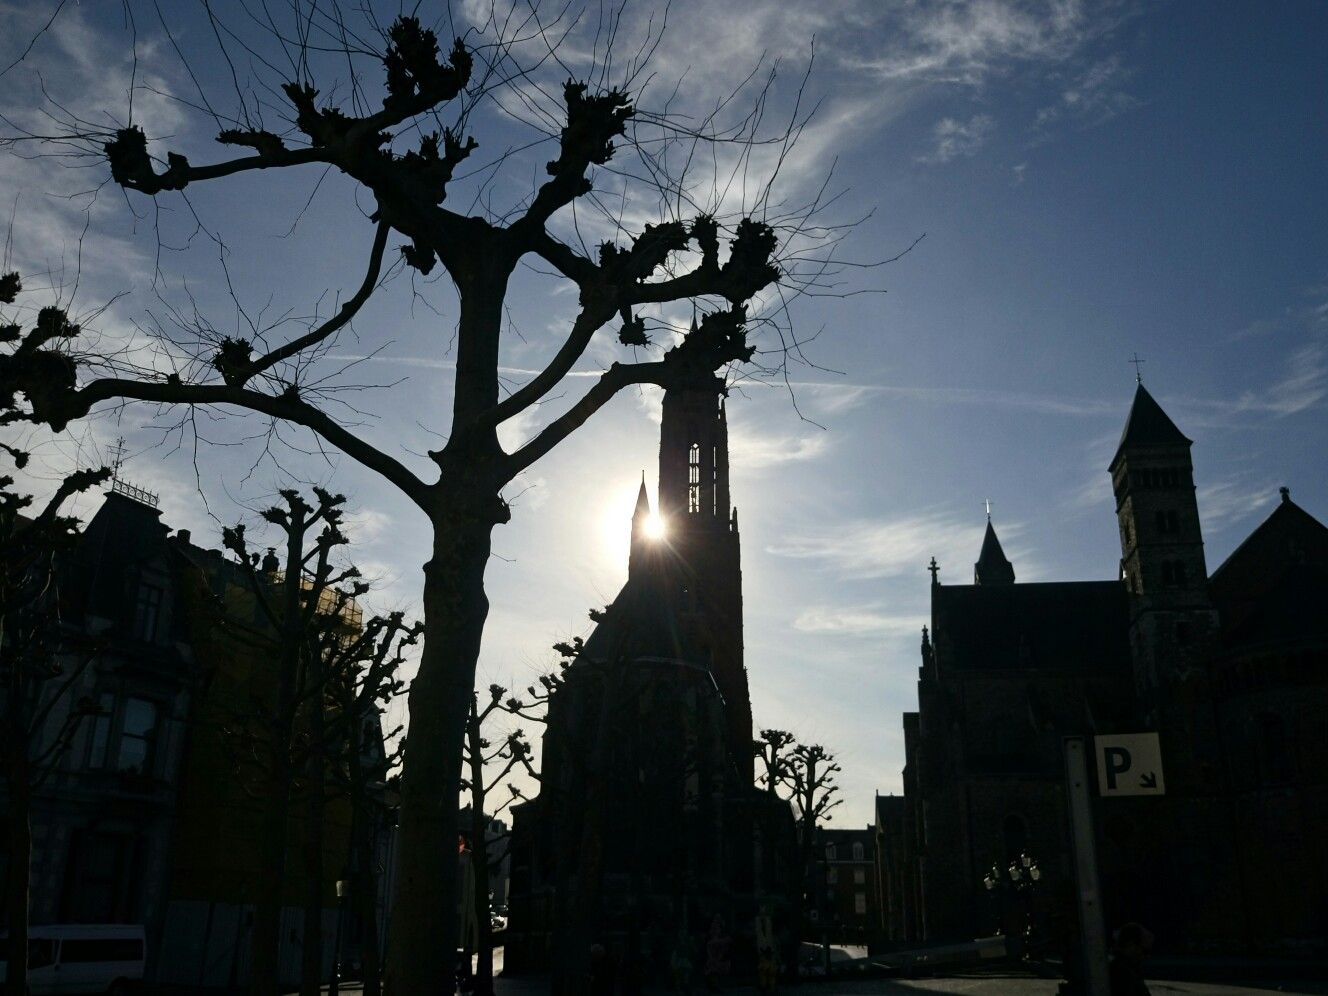 Maastricht, Vrijthof